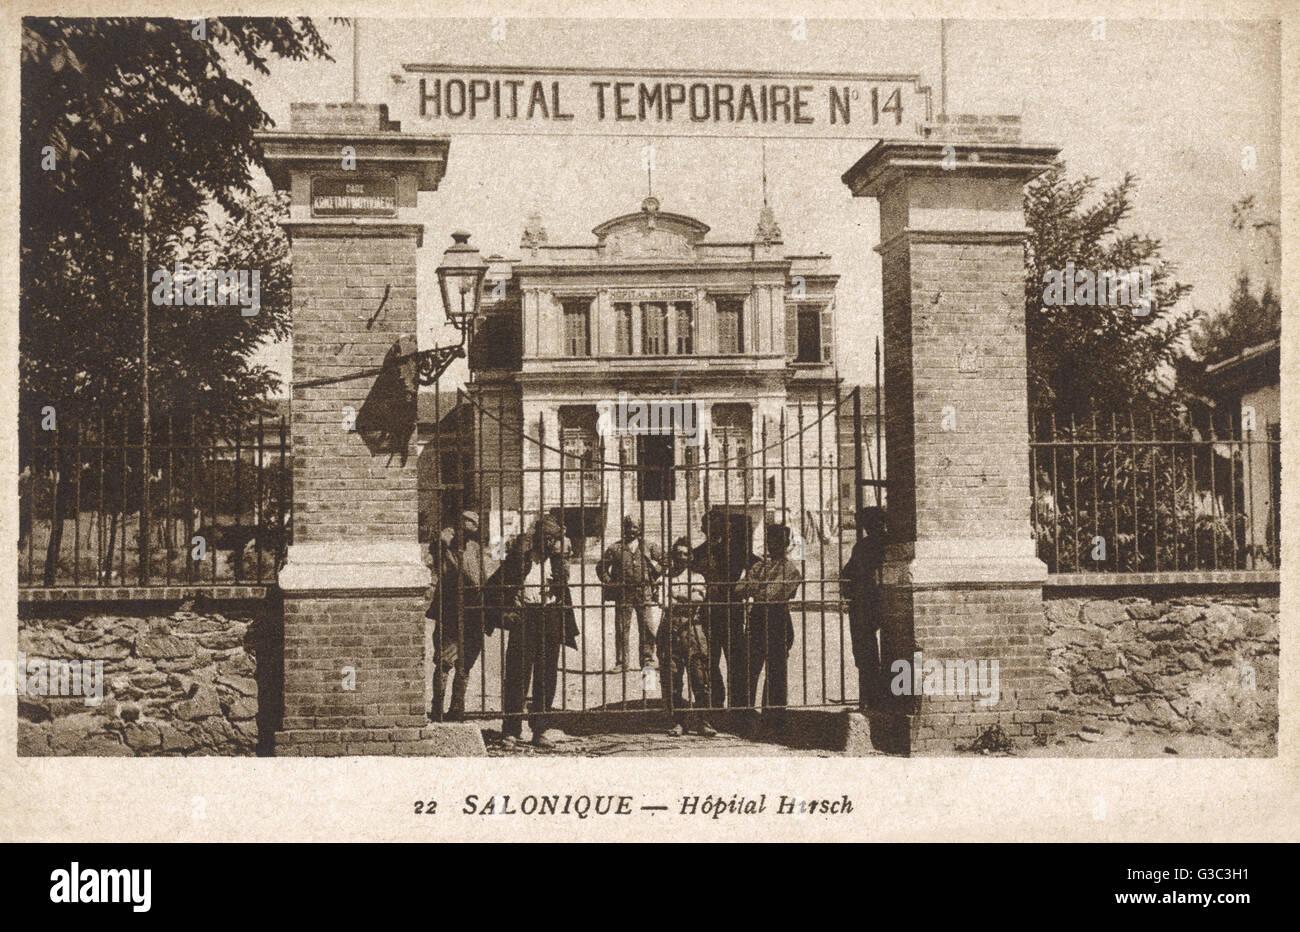 WW1 - Thessaloniki, Greece - Hirsch Hospital - Temporary Hospital No.14     Date: circa 1916 - Stock Image